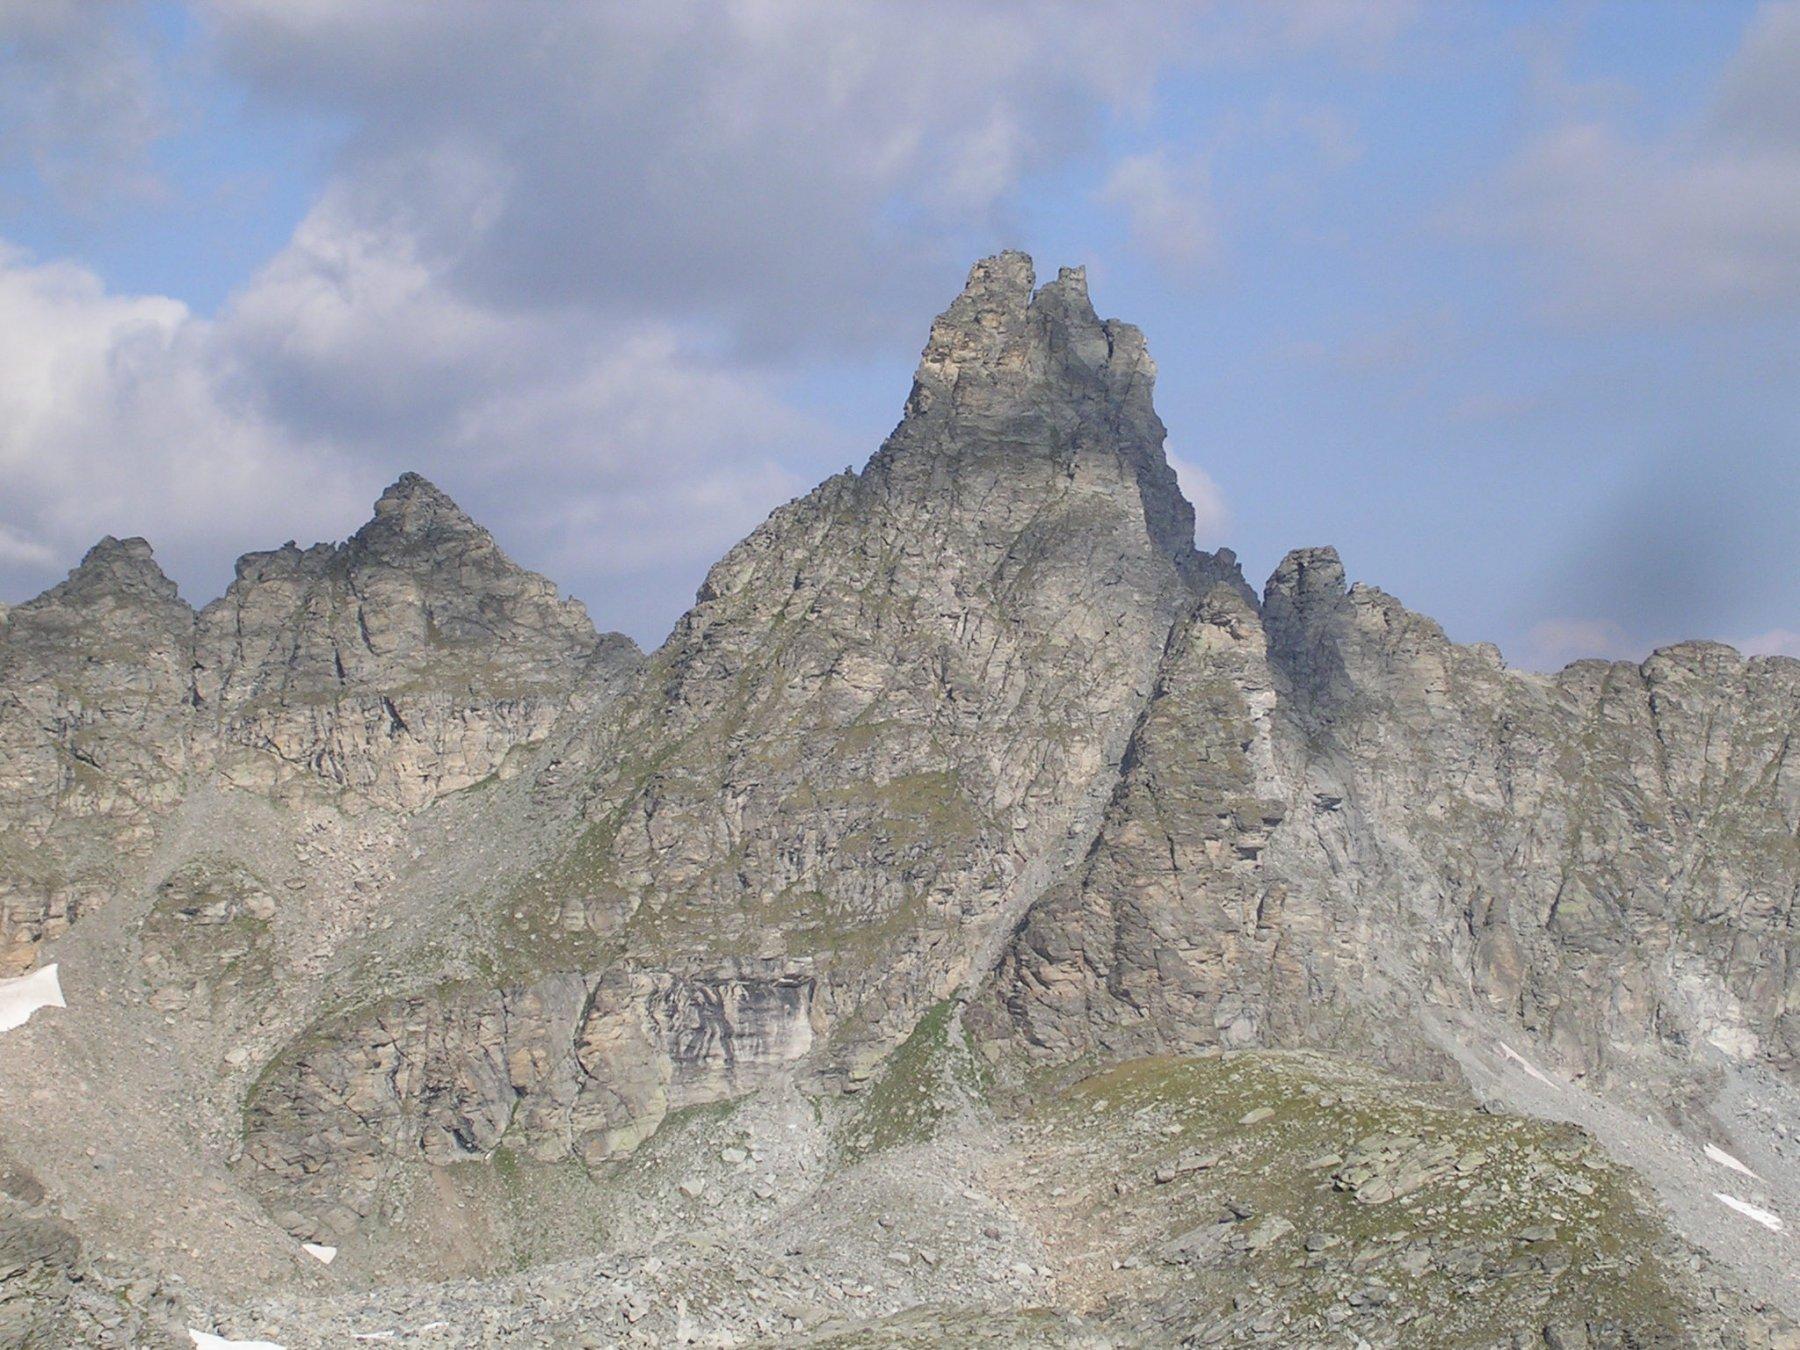 Una bella montagna in Francia vista dal colle